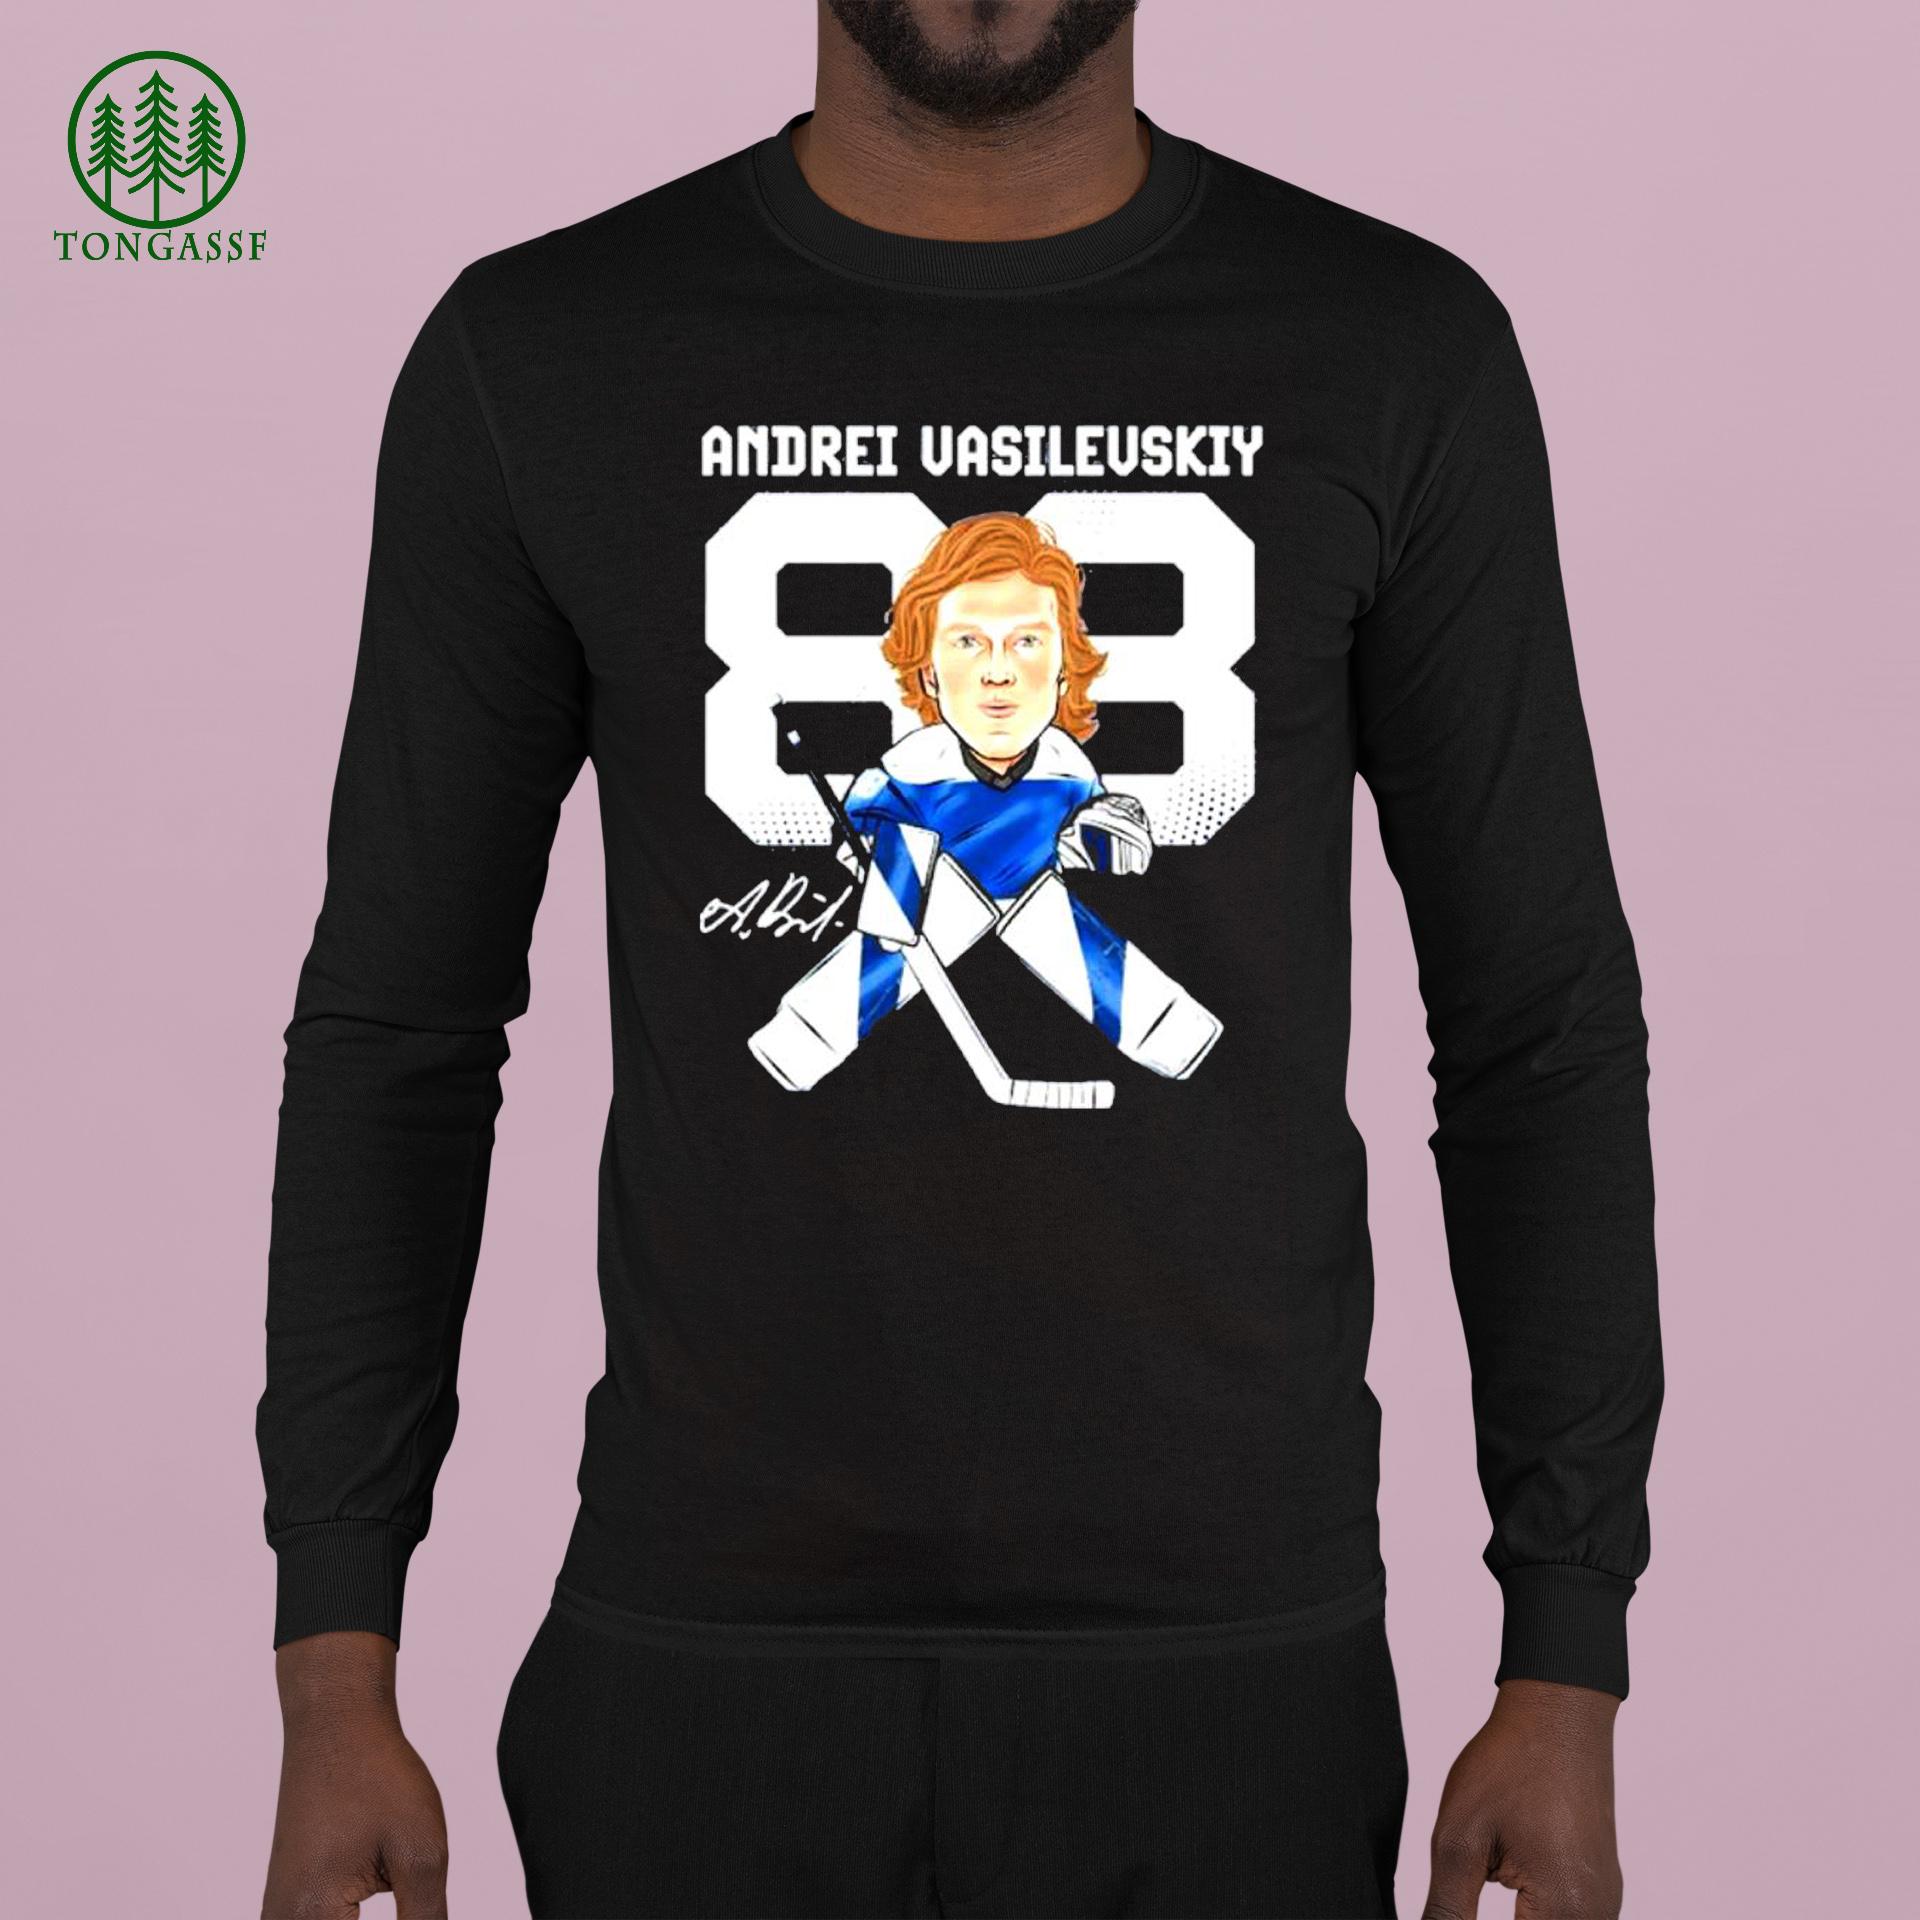 tampa bay lightning 88 andrei vasilevskiy cartoon signature Shirt